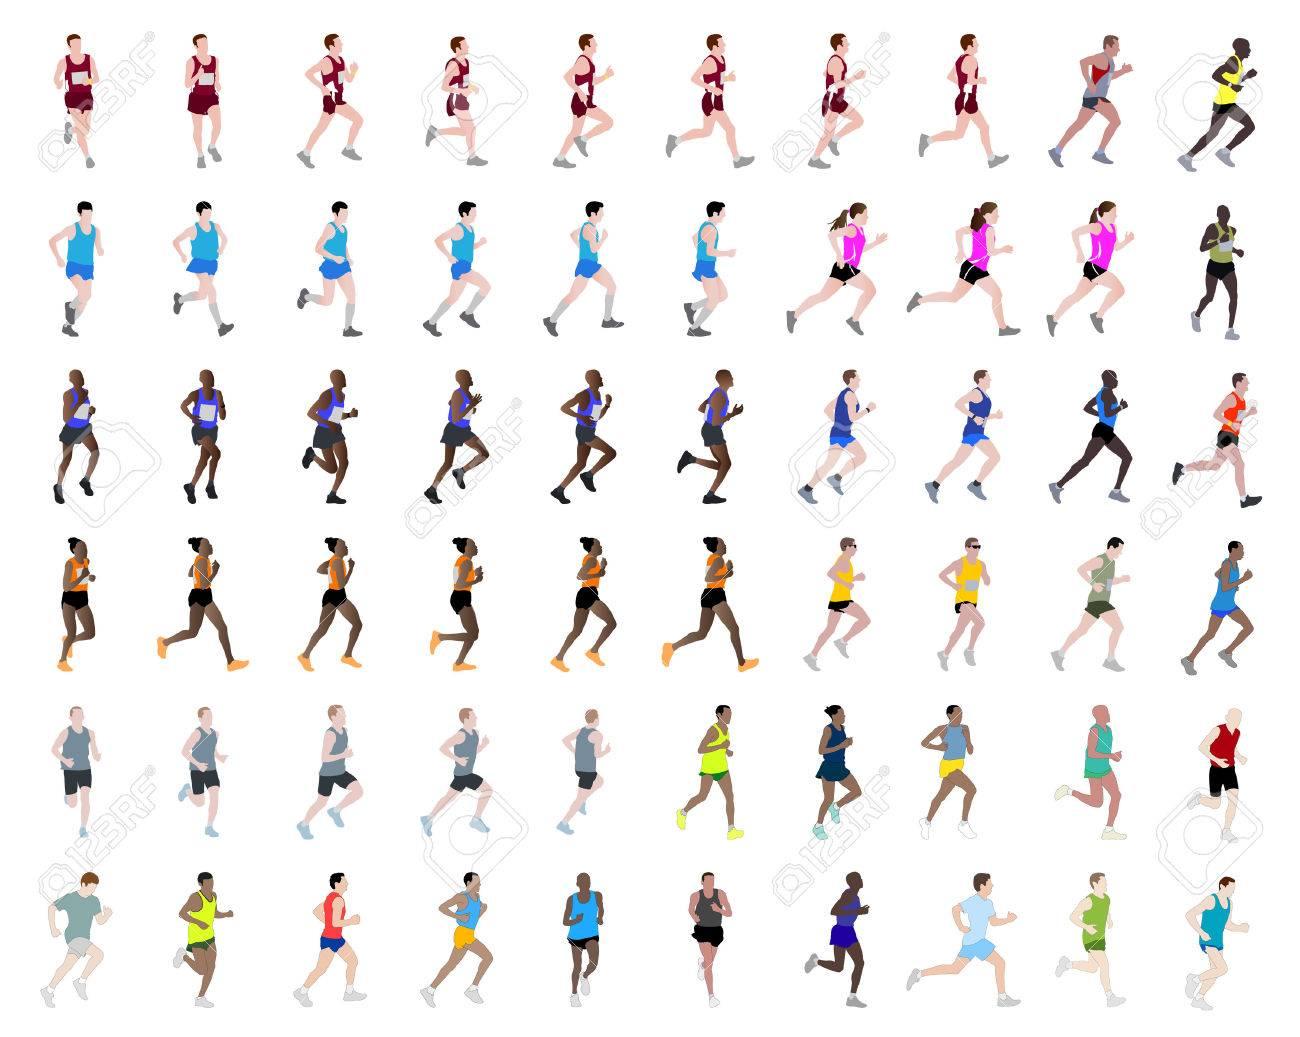 60 people running illustrations - 31677243